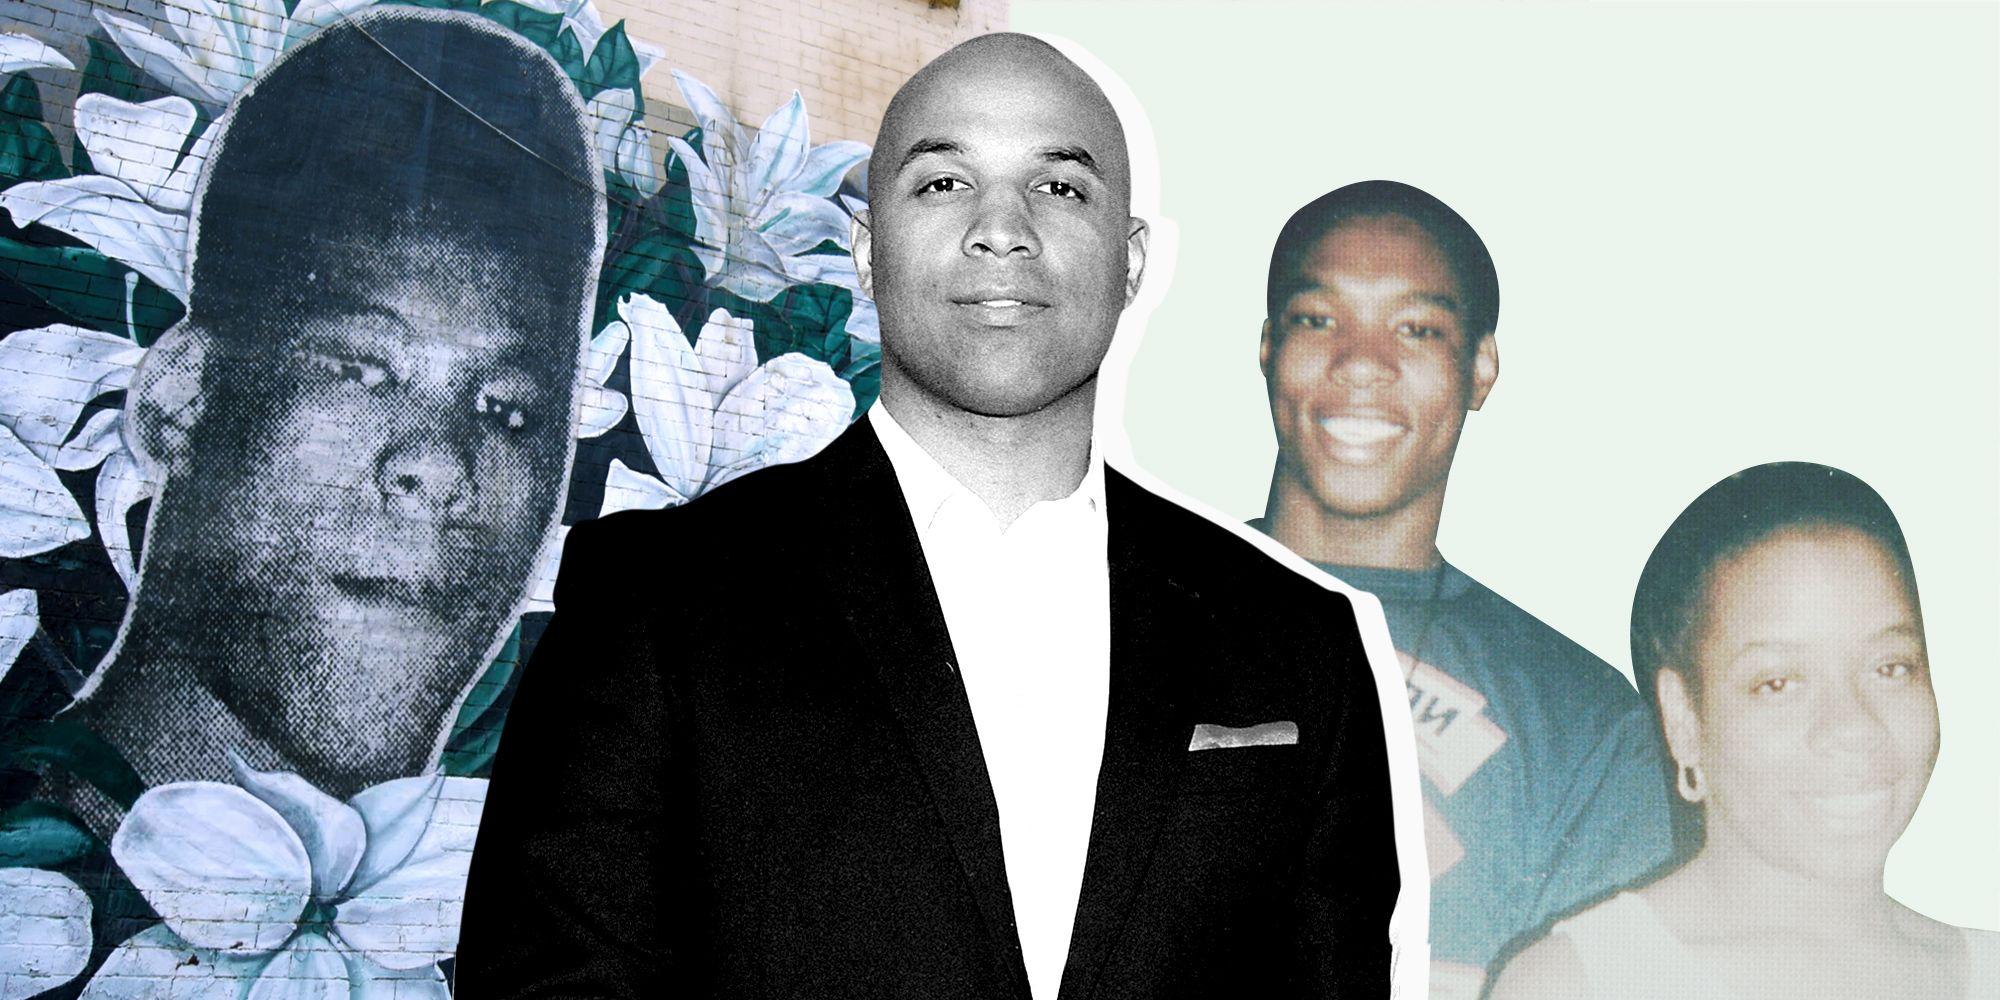 31 Years Ago Yusuf Hawkins Was Killed in Brooklyn. Donald Trump's Rhetoric Fueled the Hatred.